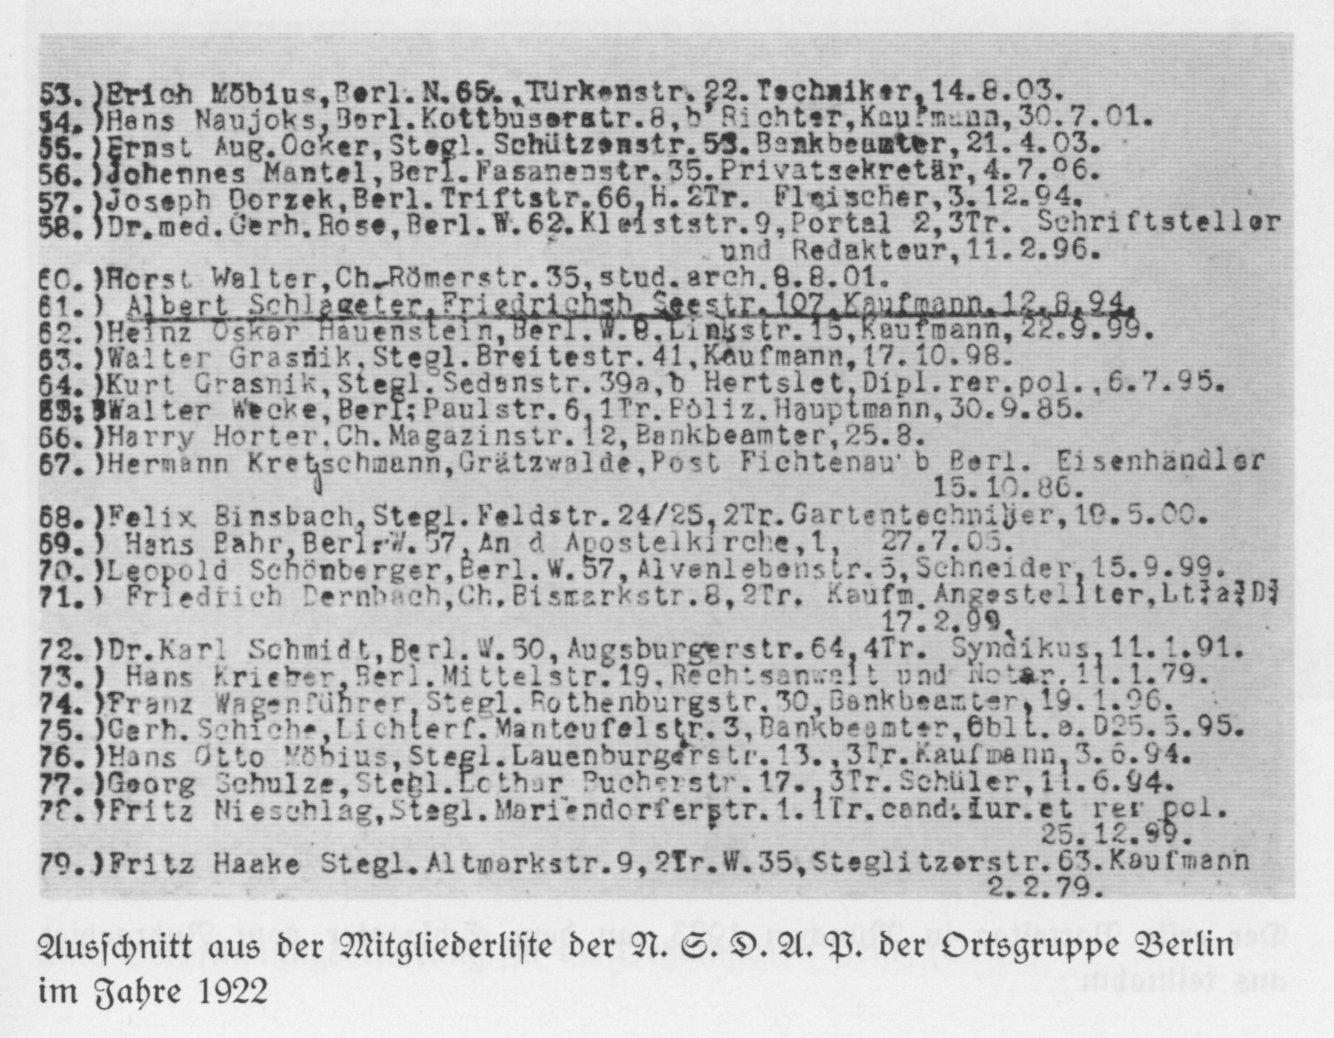 https://i0.wp.com/de.metapedia.org/m/images/a/a1/Mitgliederliste_Ortsgruppe_Berlin_NSDAP_1922.jpg